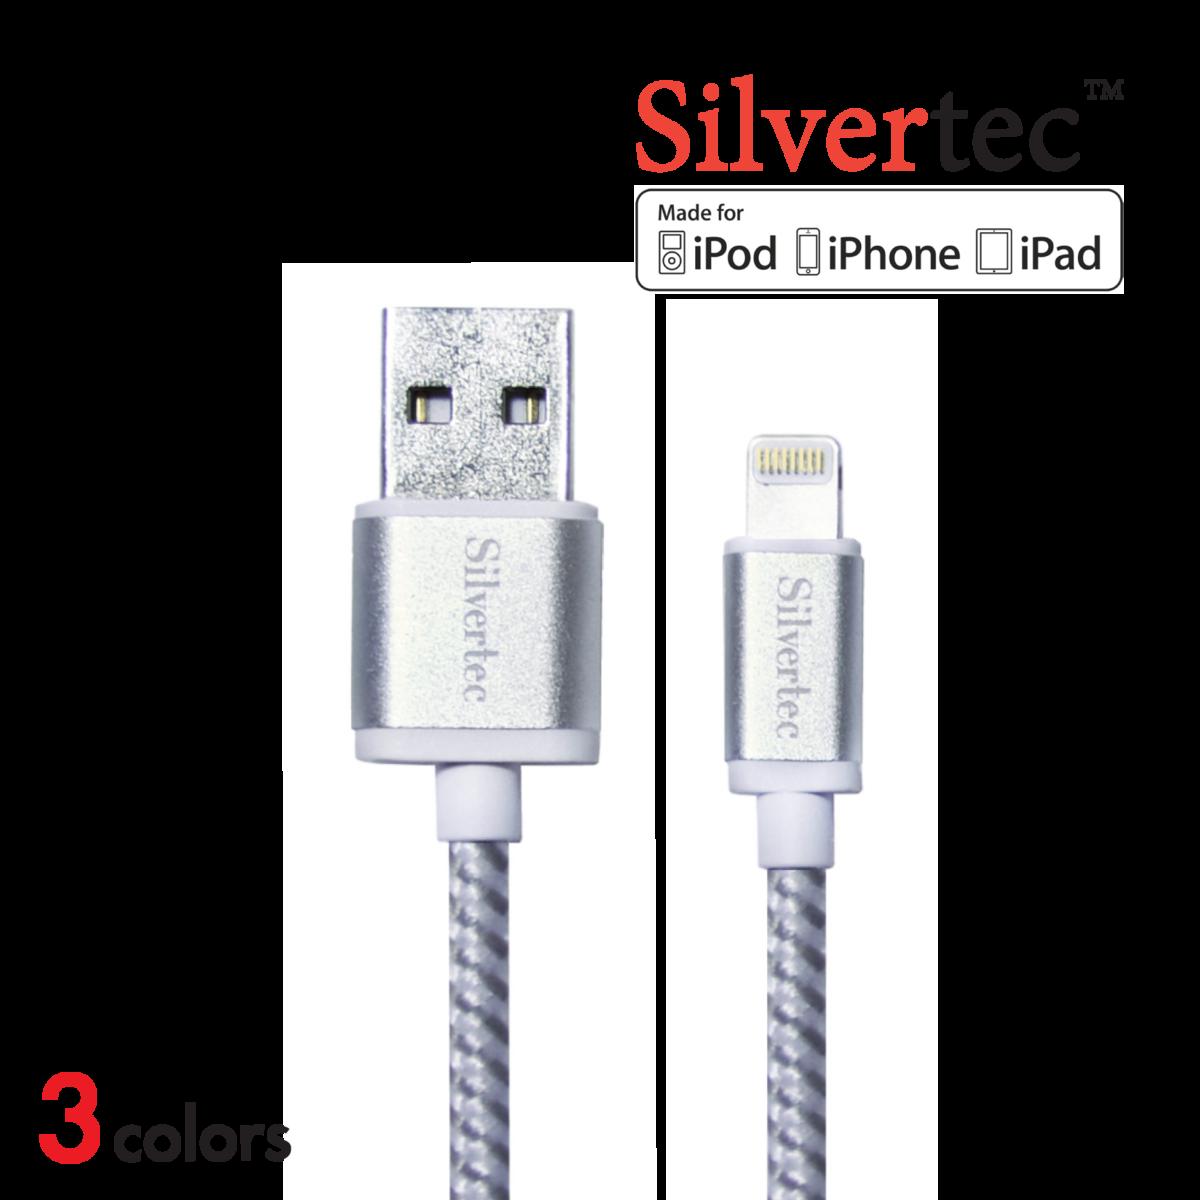 iPhone MFI蘋果驗證 Lightning 1m 雙面USB充電線 (3色)